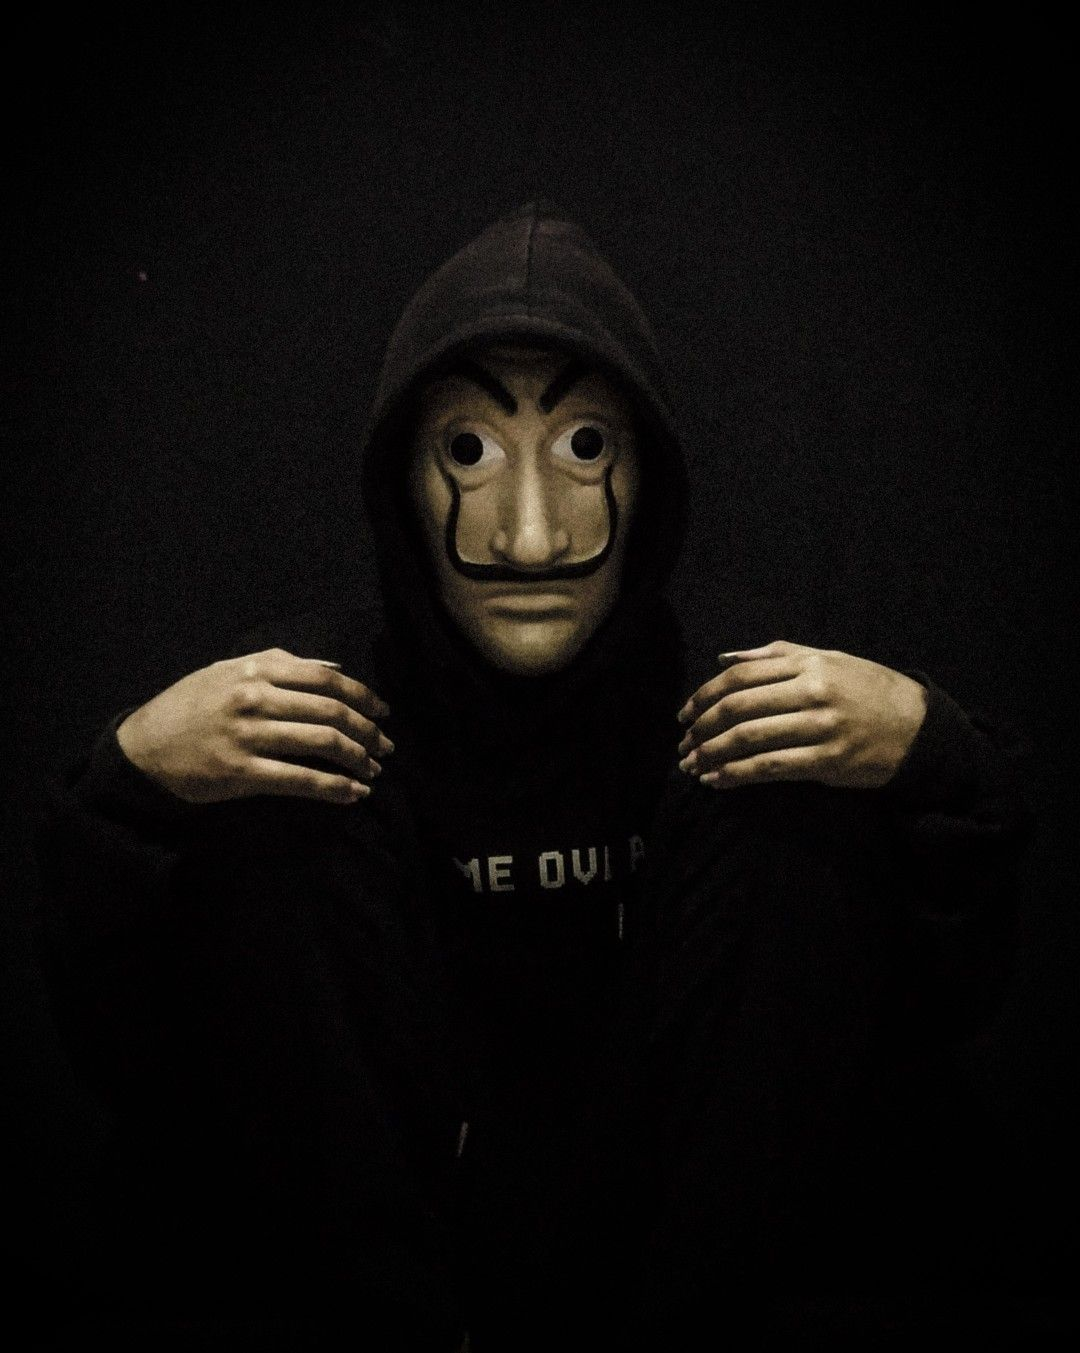 Dali Mask Money Heist Mask Space Art Photo Movie Posters Iphone money heist mask wallpaper hd